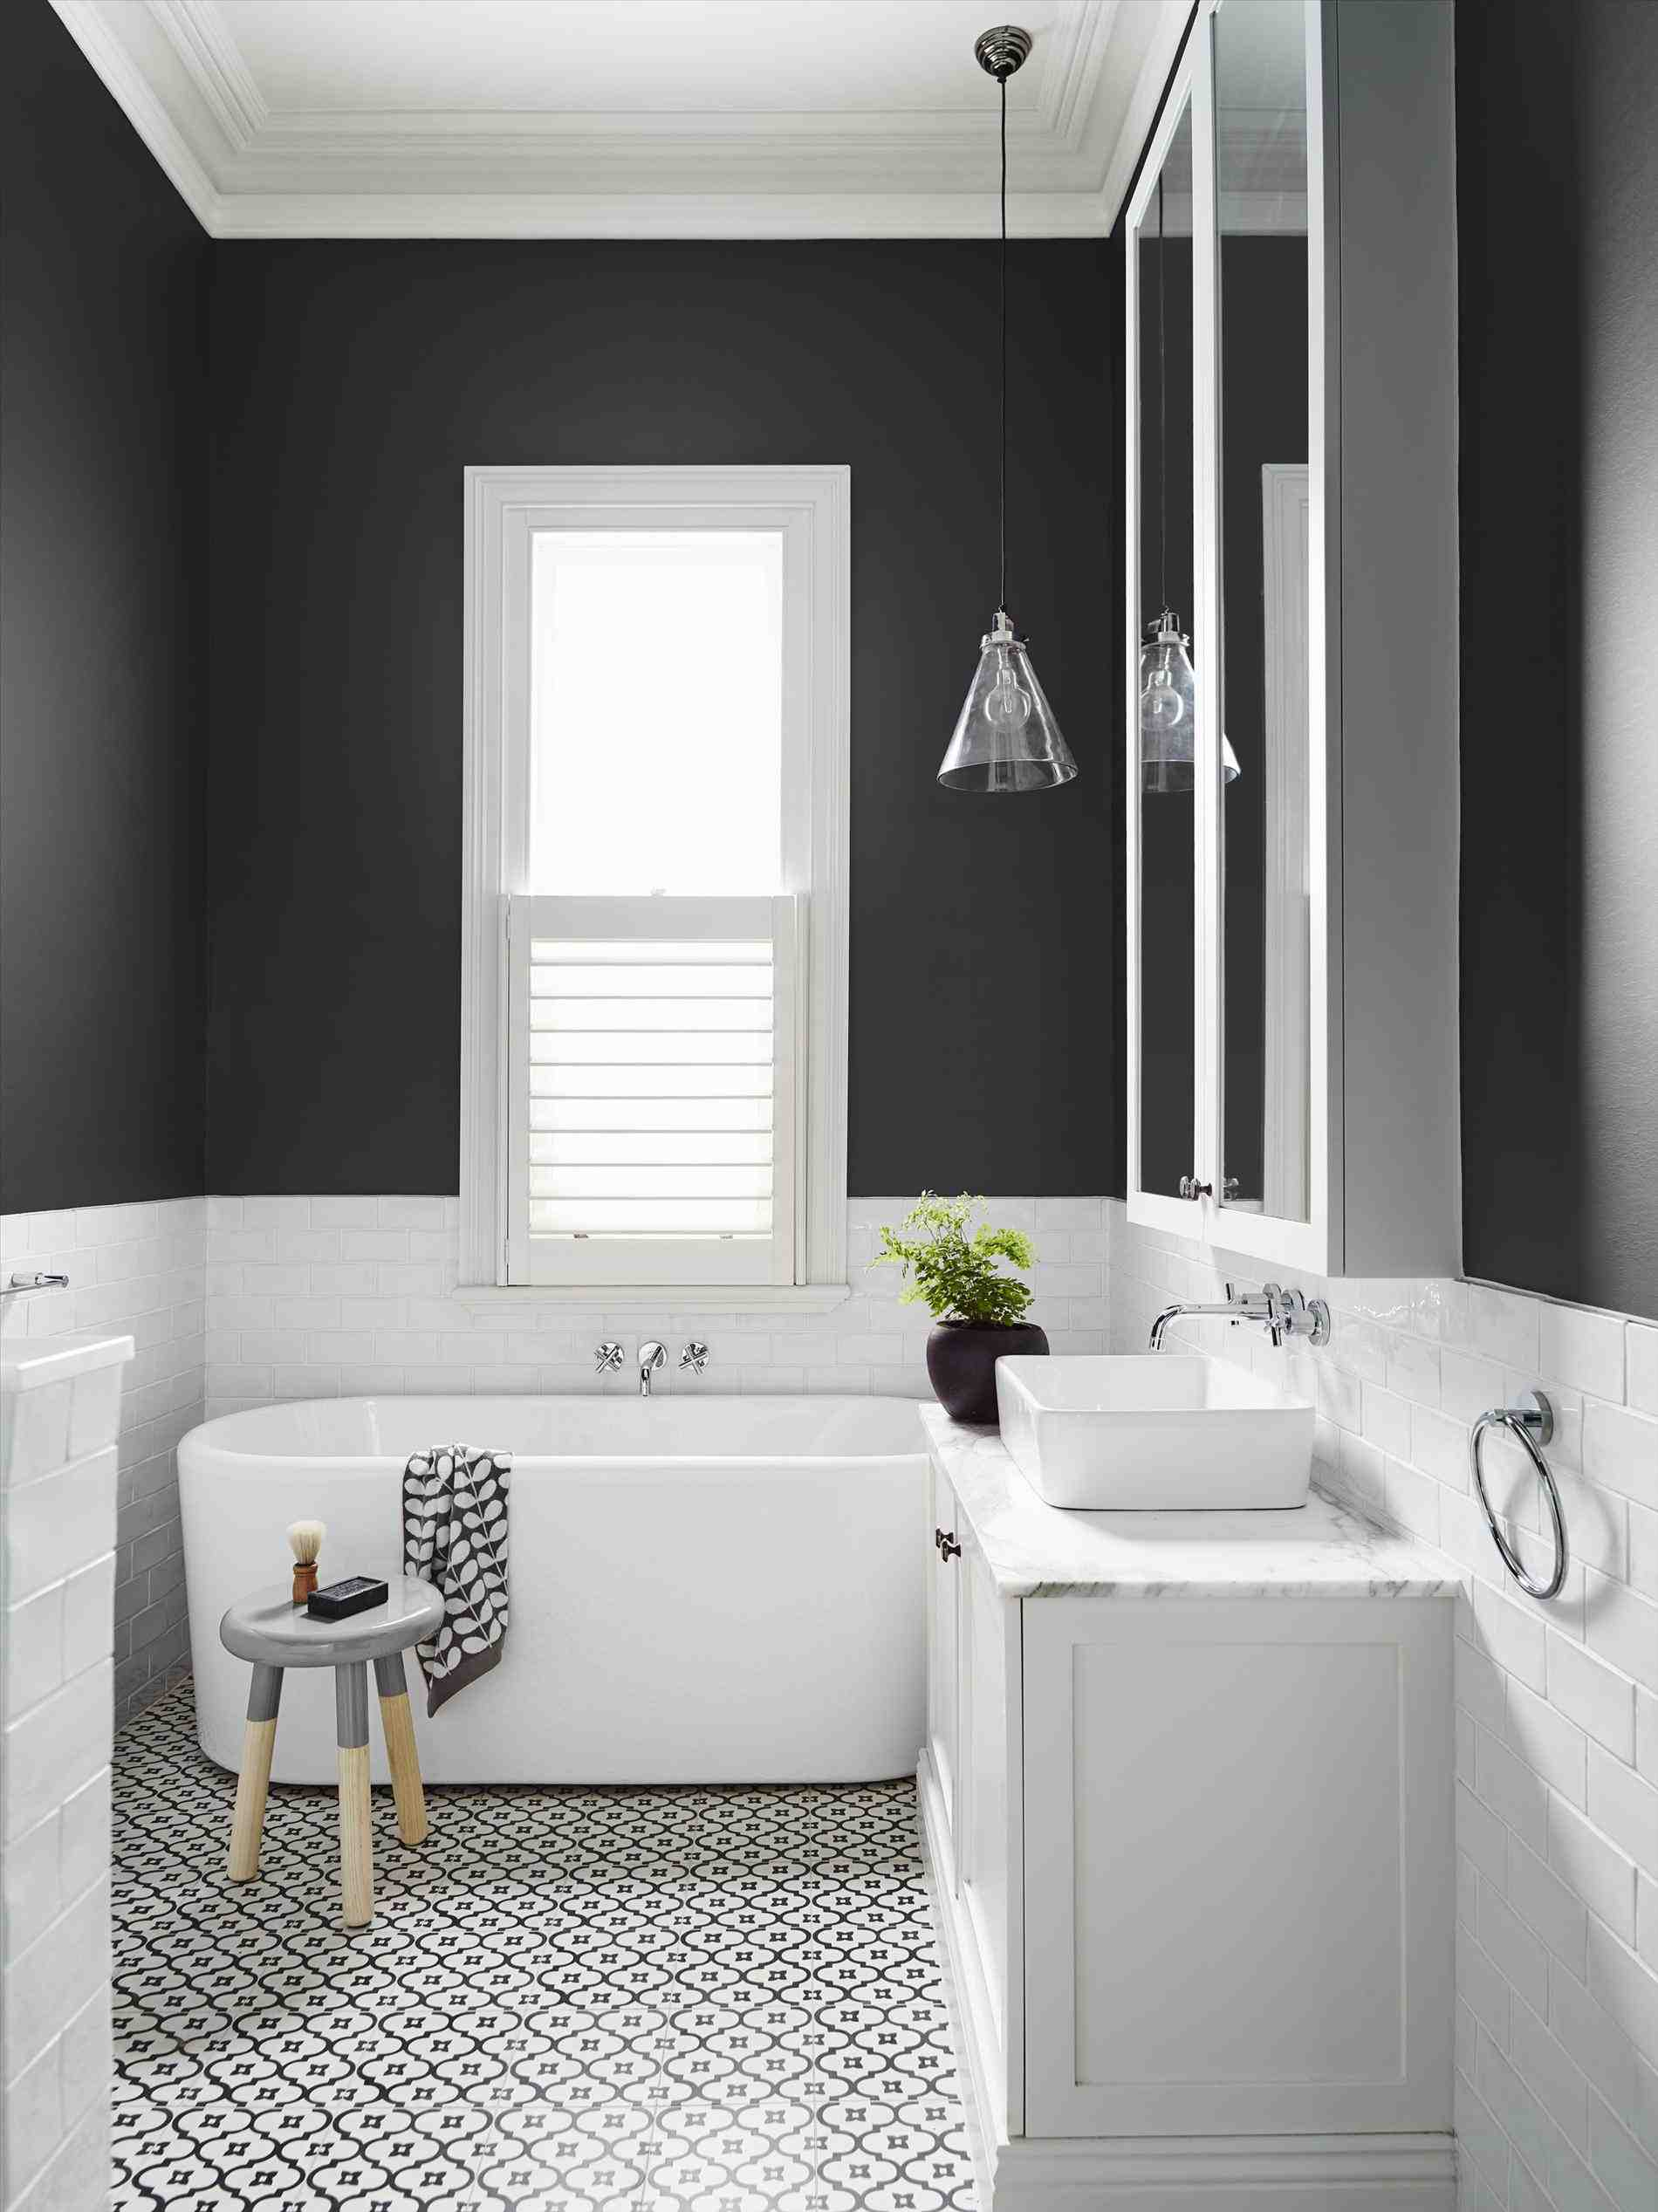 Покраска ванны: подробная инструкция